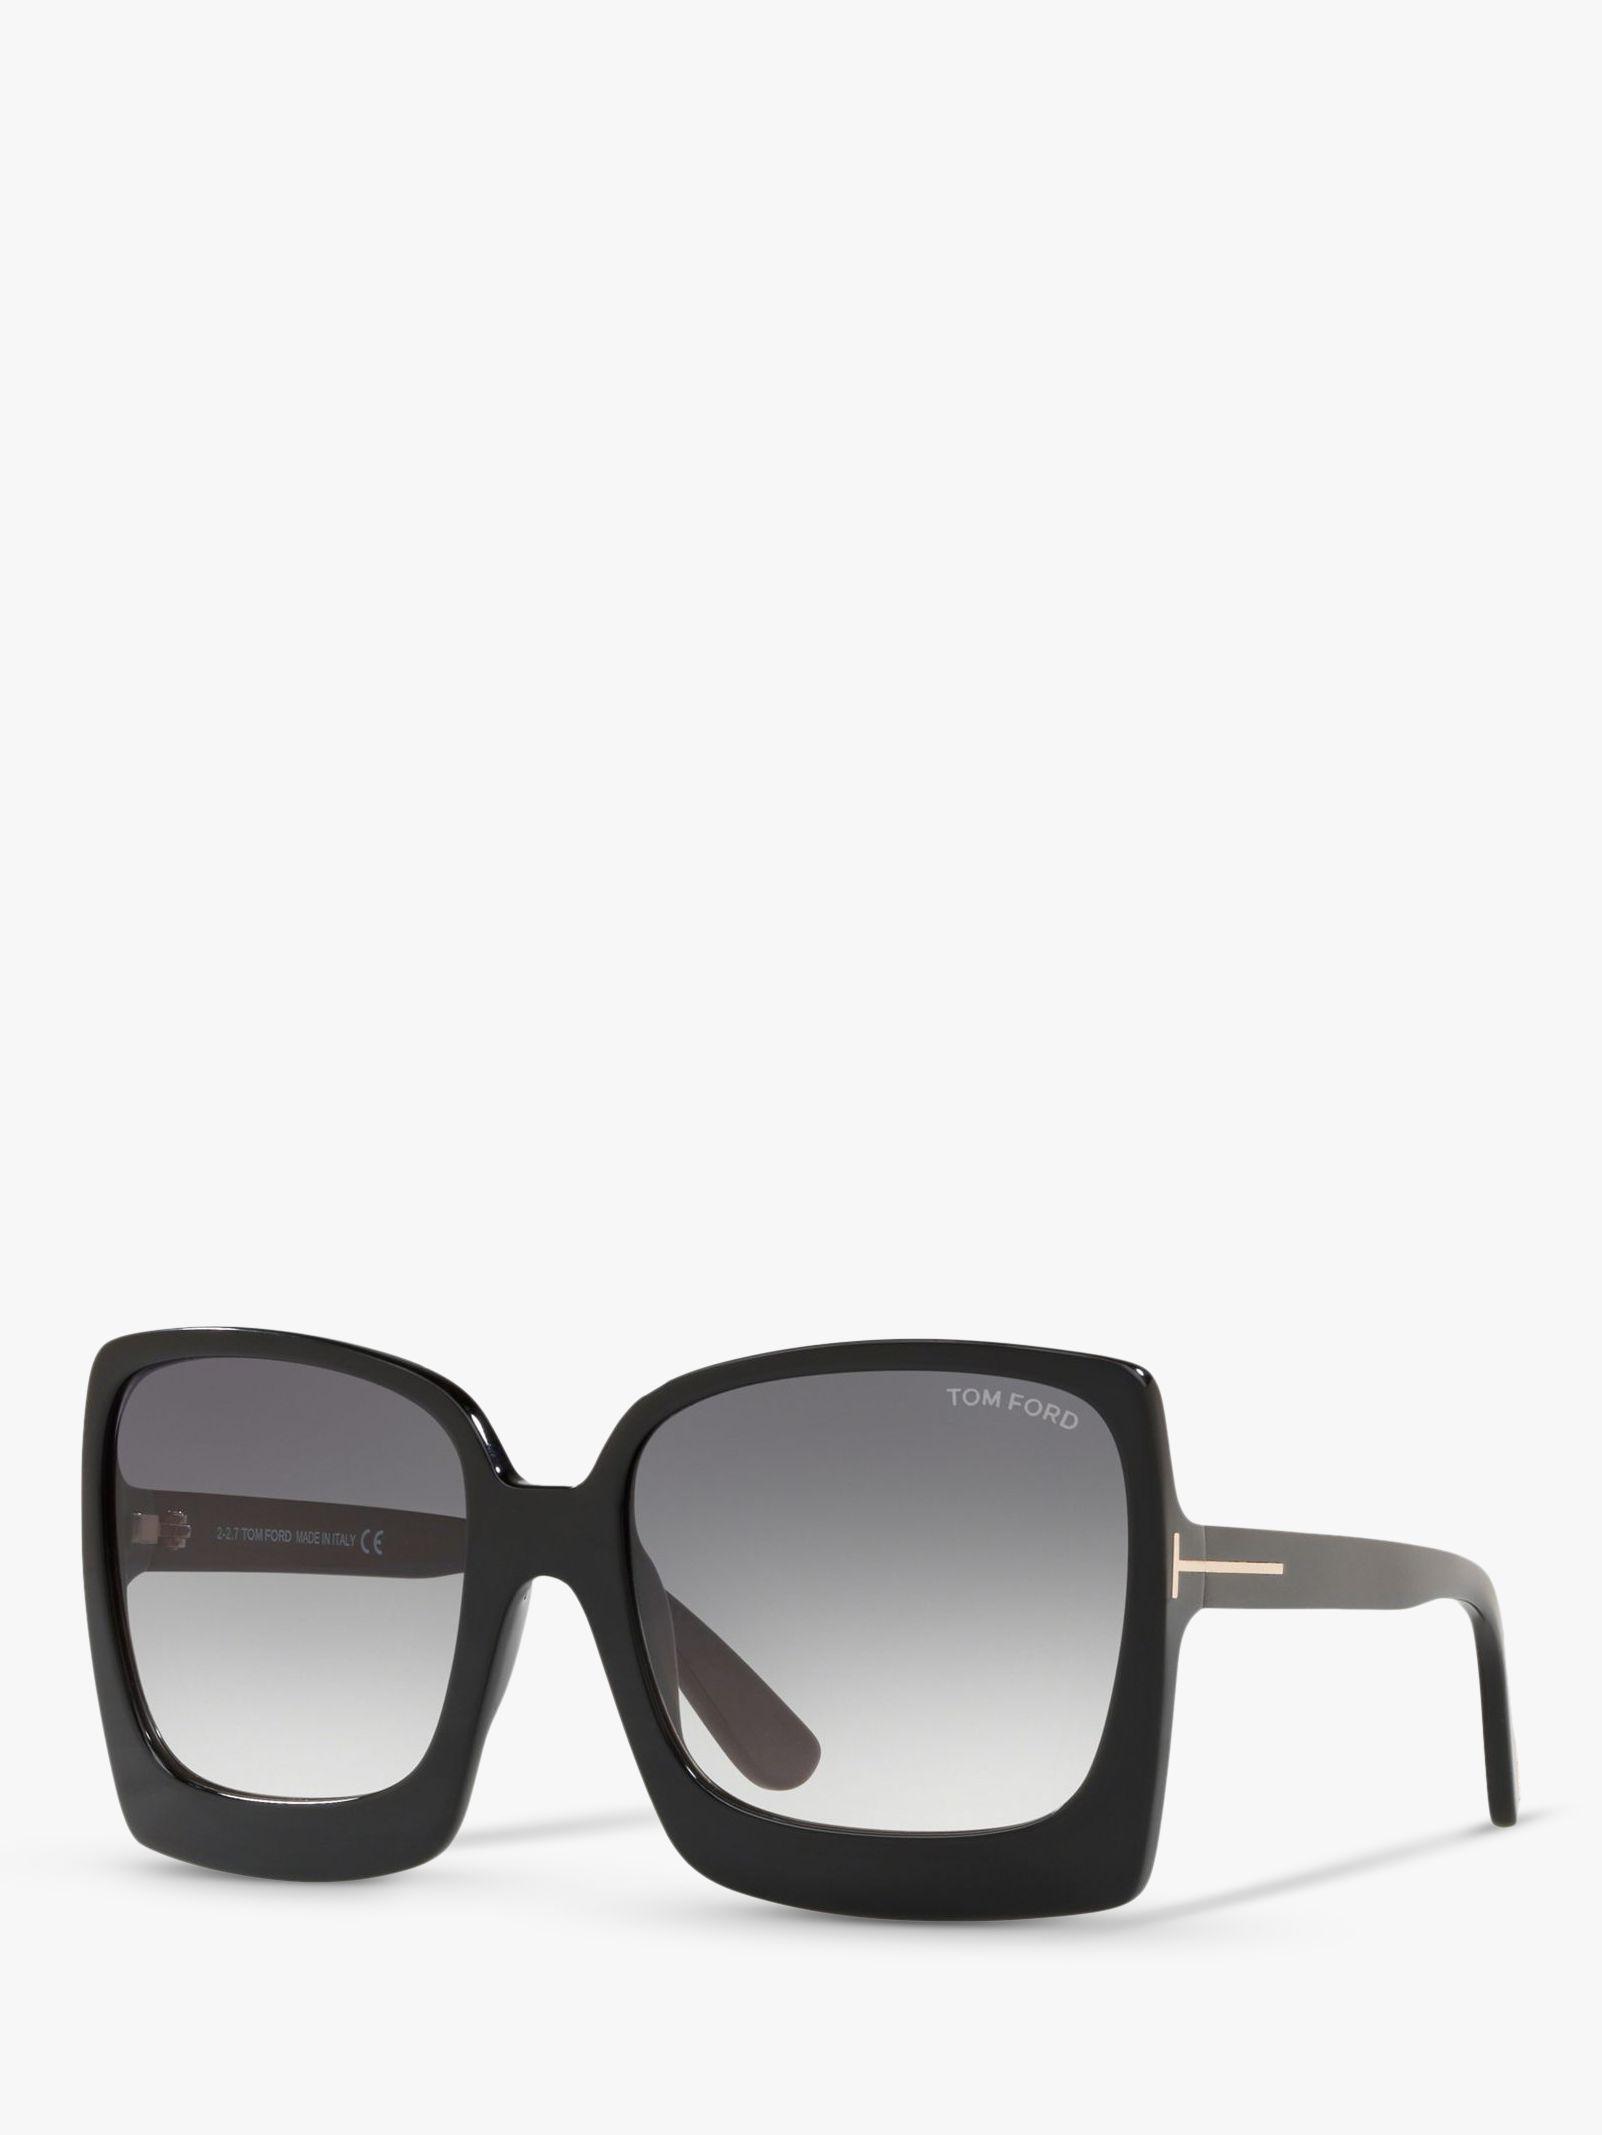 Tom Ford TOM FORD FT0617 Women's Katrine-02 Oversized Square Sunglasses, Black/Grey Gradient